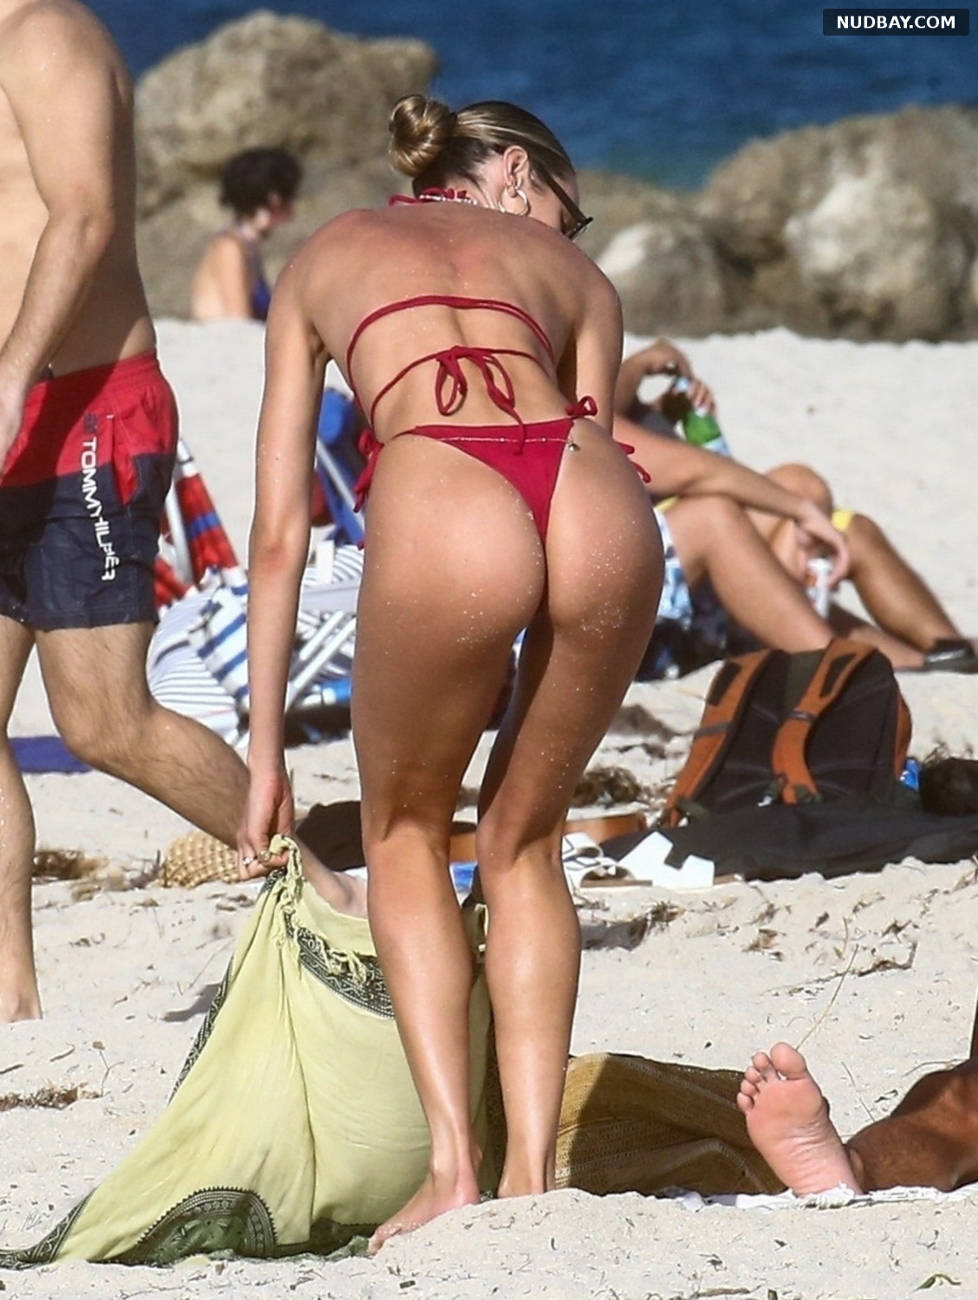 Candice Swanepoel ass in red bikini on the beach in Miami Nov 16 2020